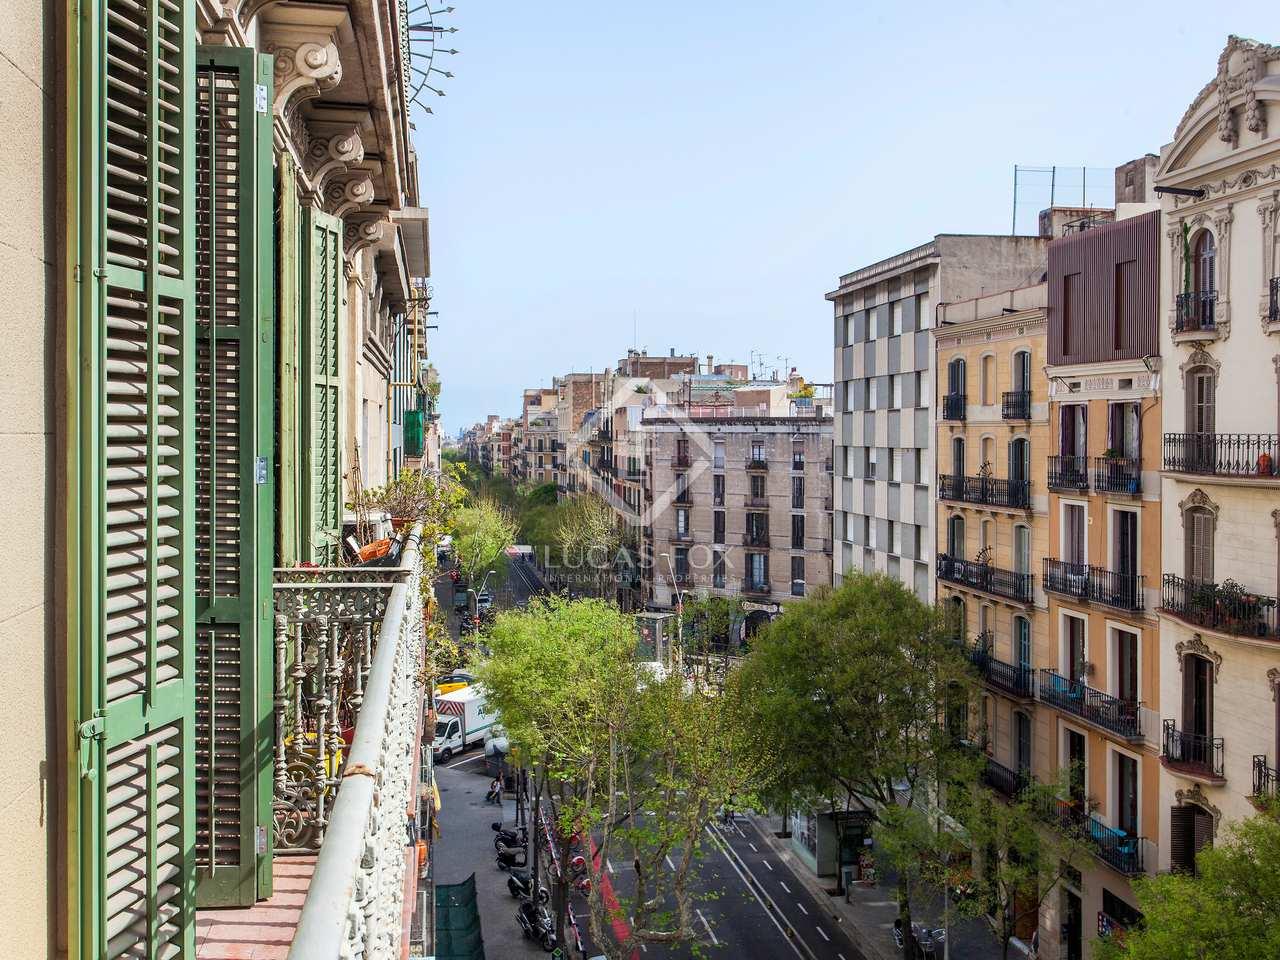 Apartamento en alquiler en la calle Girona Barcelona